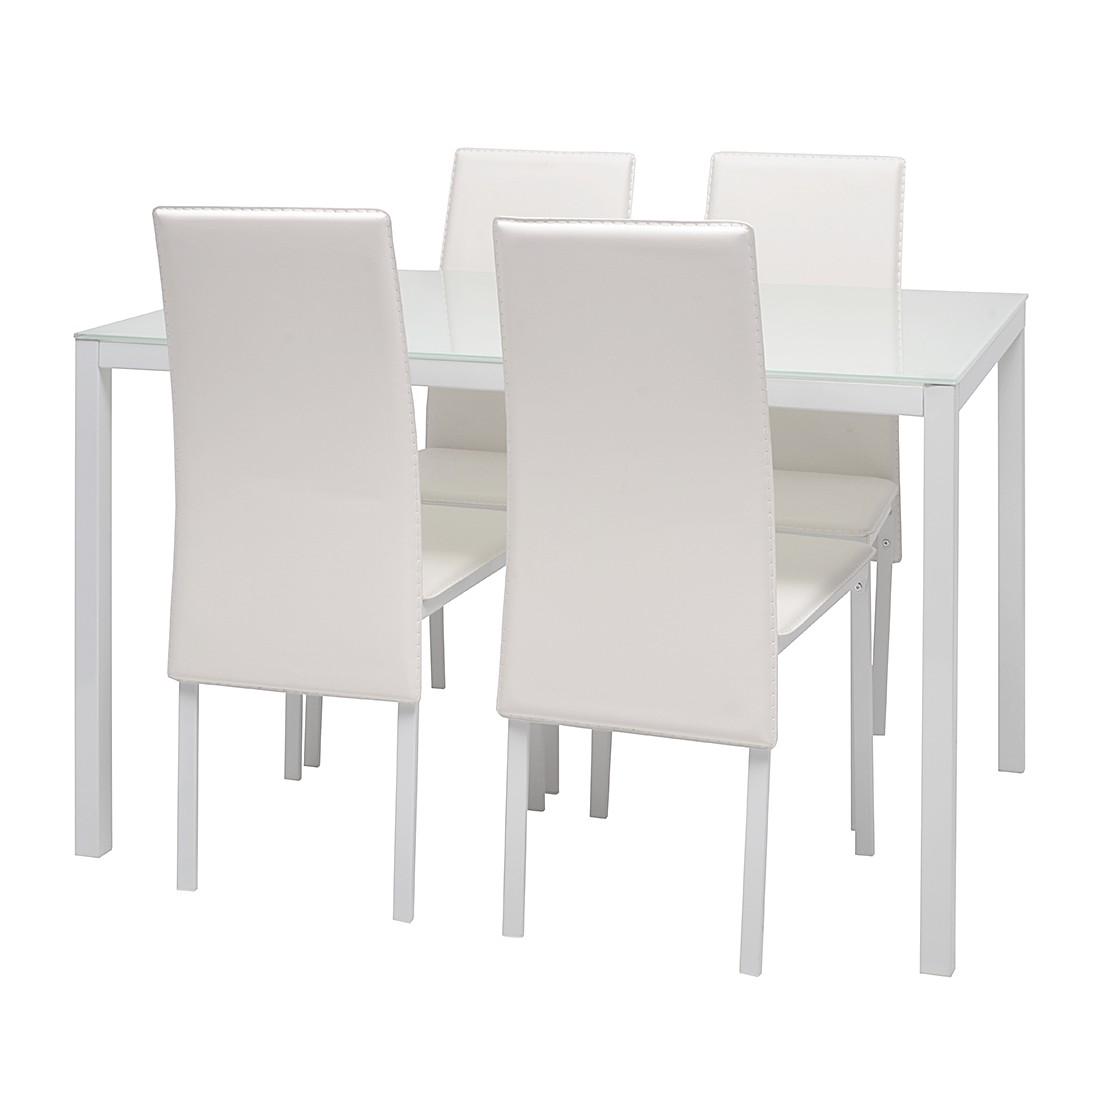 Set Tavolo Da Pranzo Dine (5 Pezzi) Bianco Set Per Sala Da Pranzo  #6D675E 1100 1100 Lampade Sala Da Pranzo